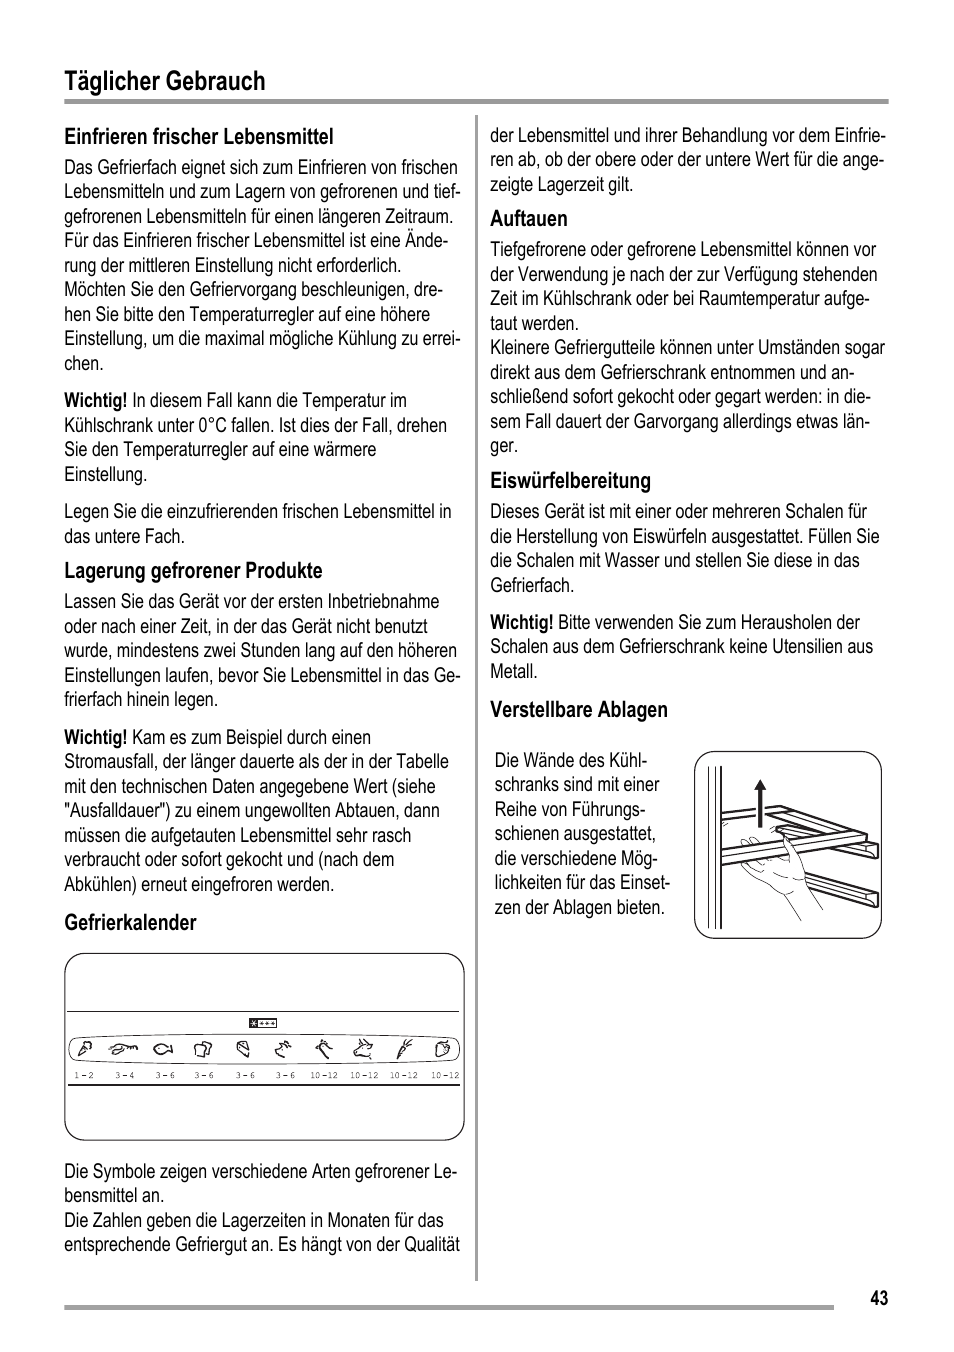 Täglicher gebrauch | ZANKER KBB 24001 SK User Manual | Page 43 / 56